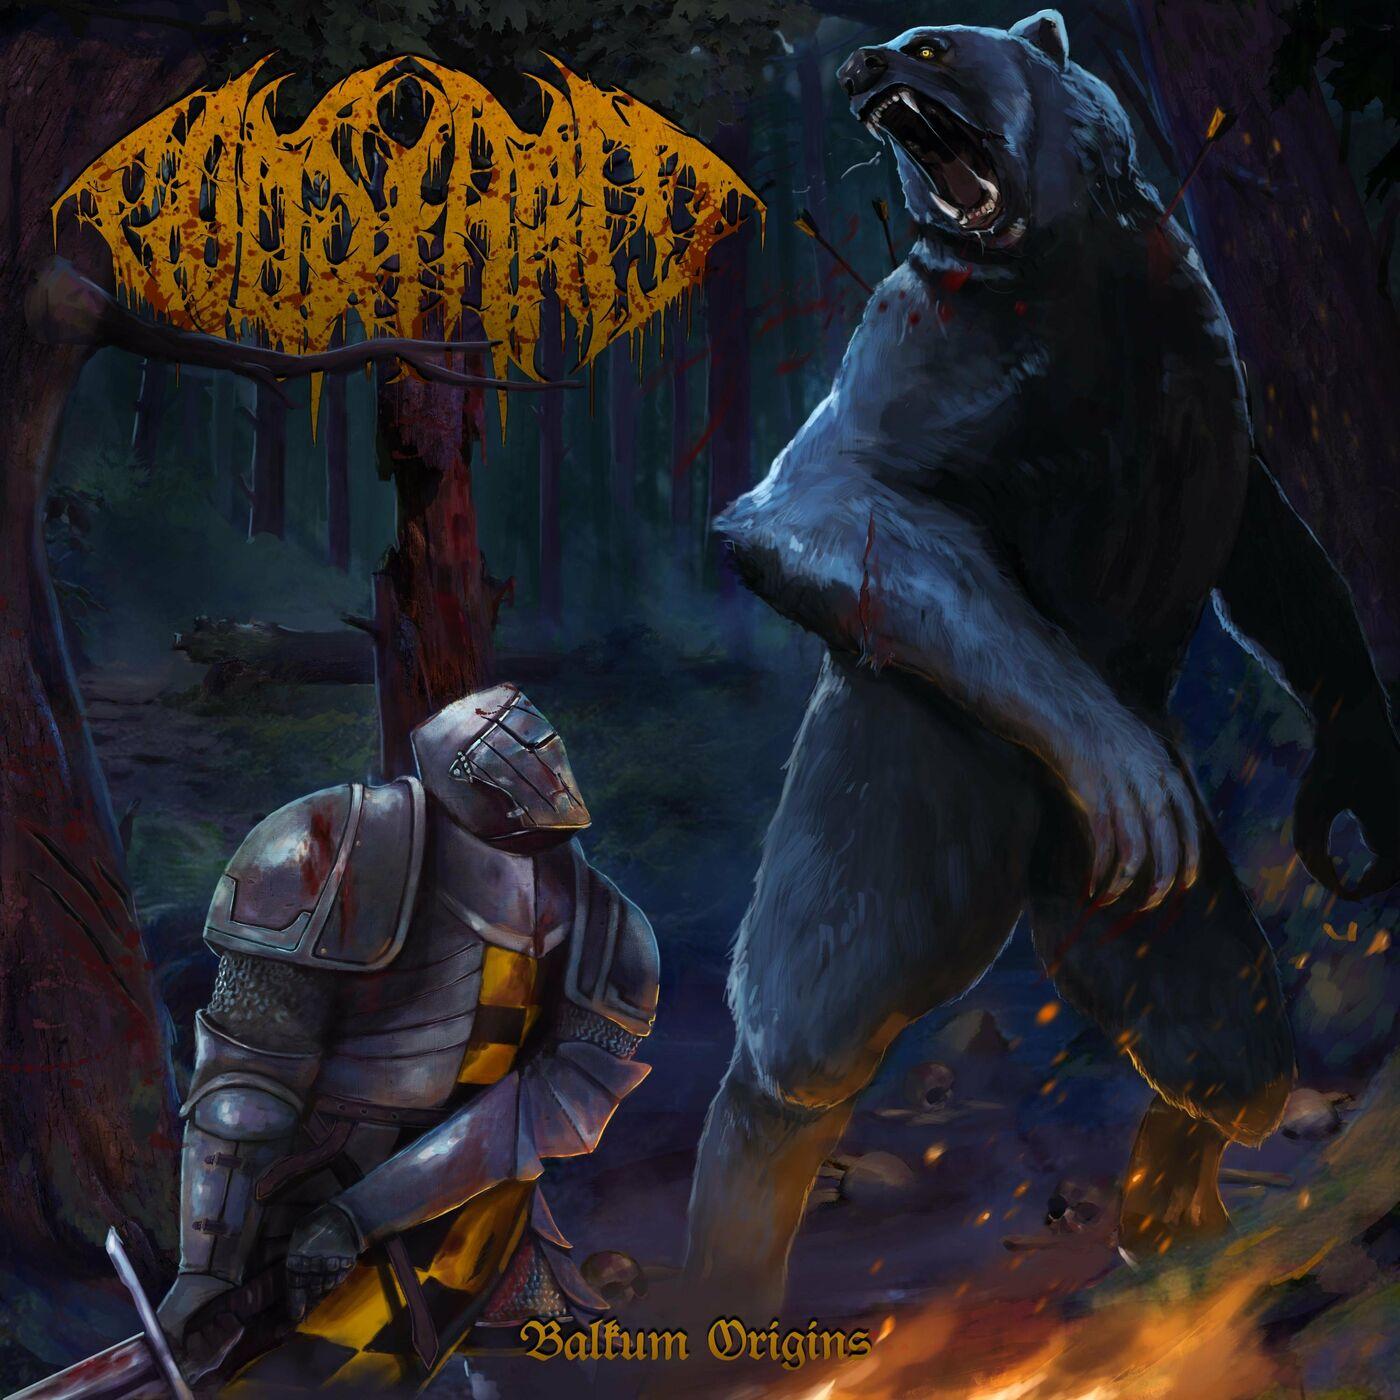 Godsfarm - Lords in Collision [single] (2020)